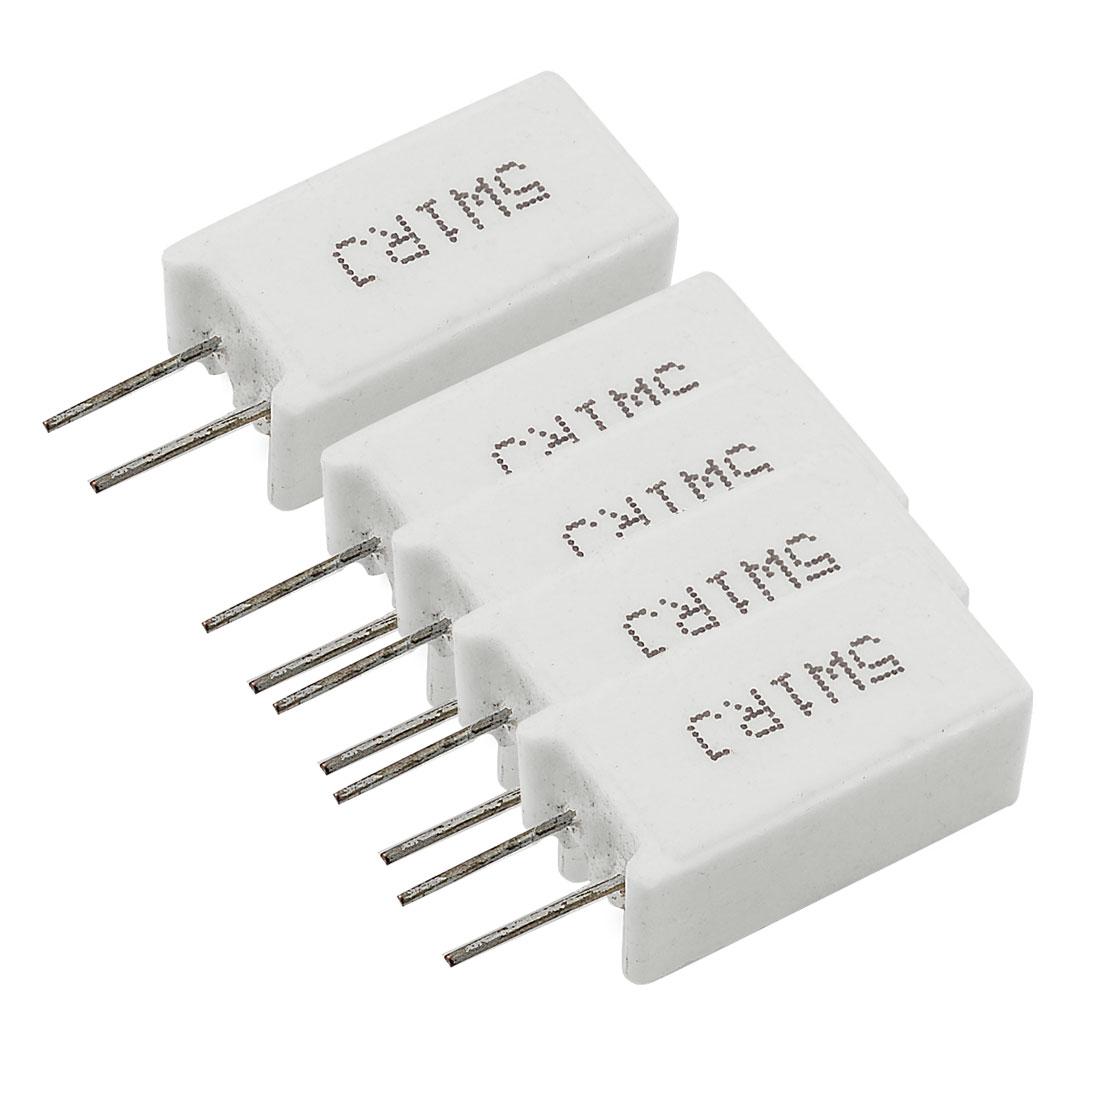 5 Pcs Wirewound Radial Lead Cement Resistors 5% 5W 5 Watt 1 Ohm